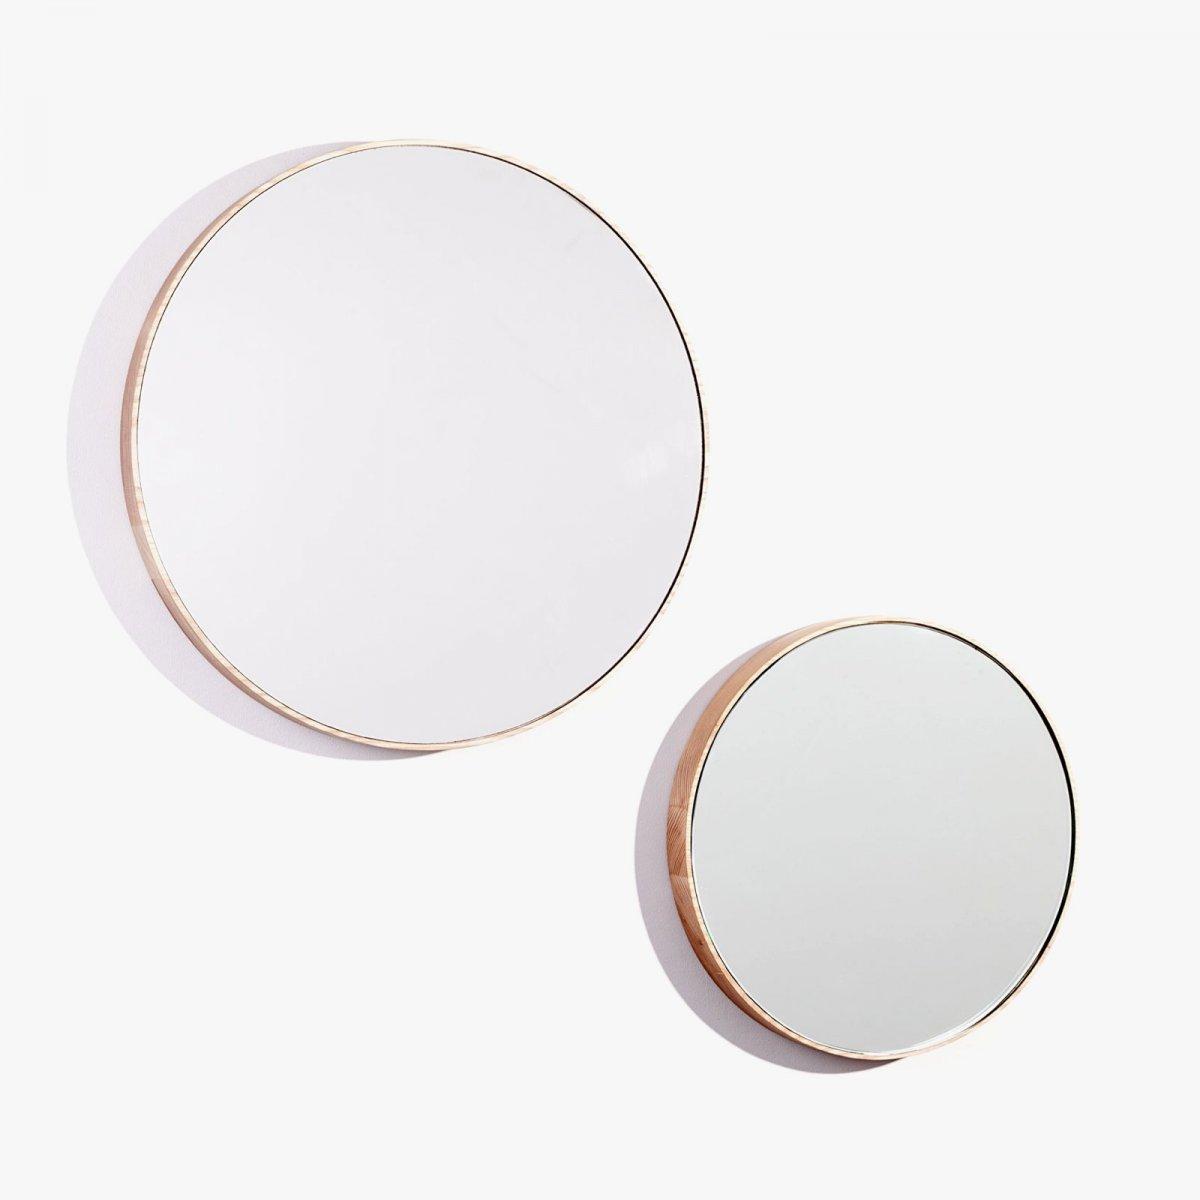 WM1 Wall Mirrors.